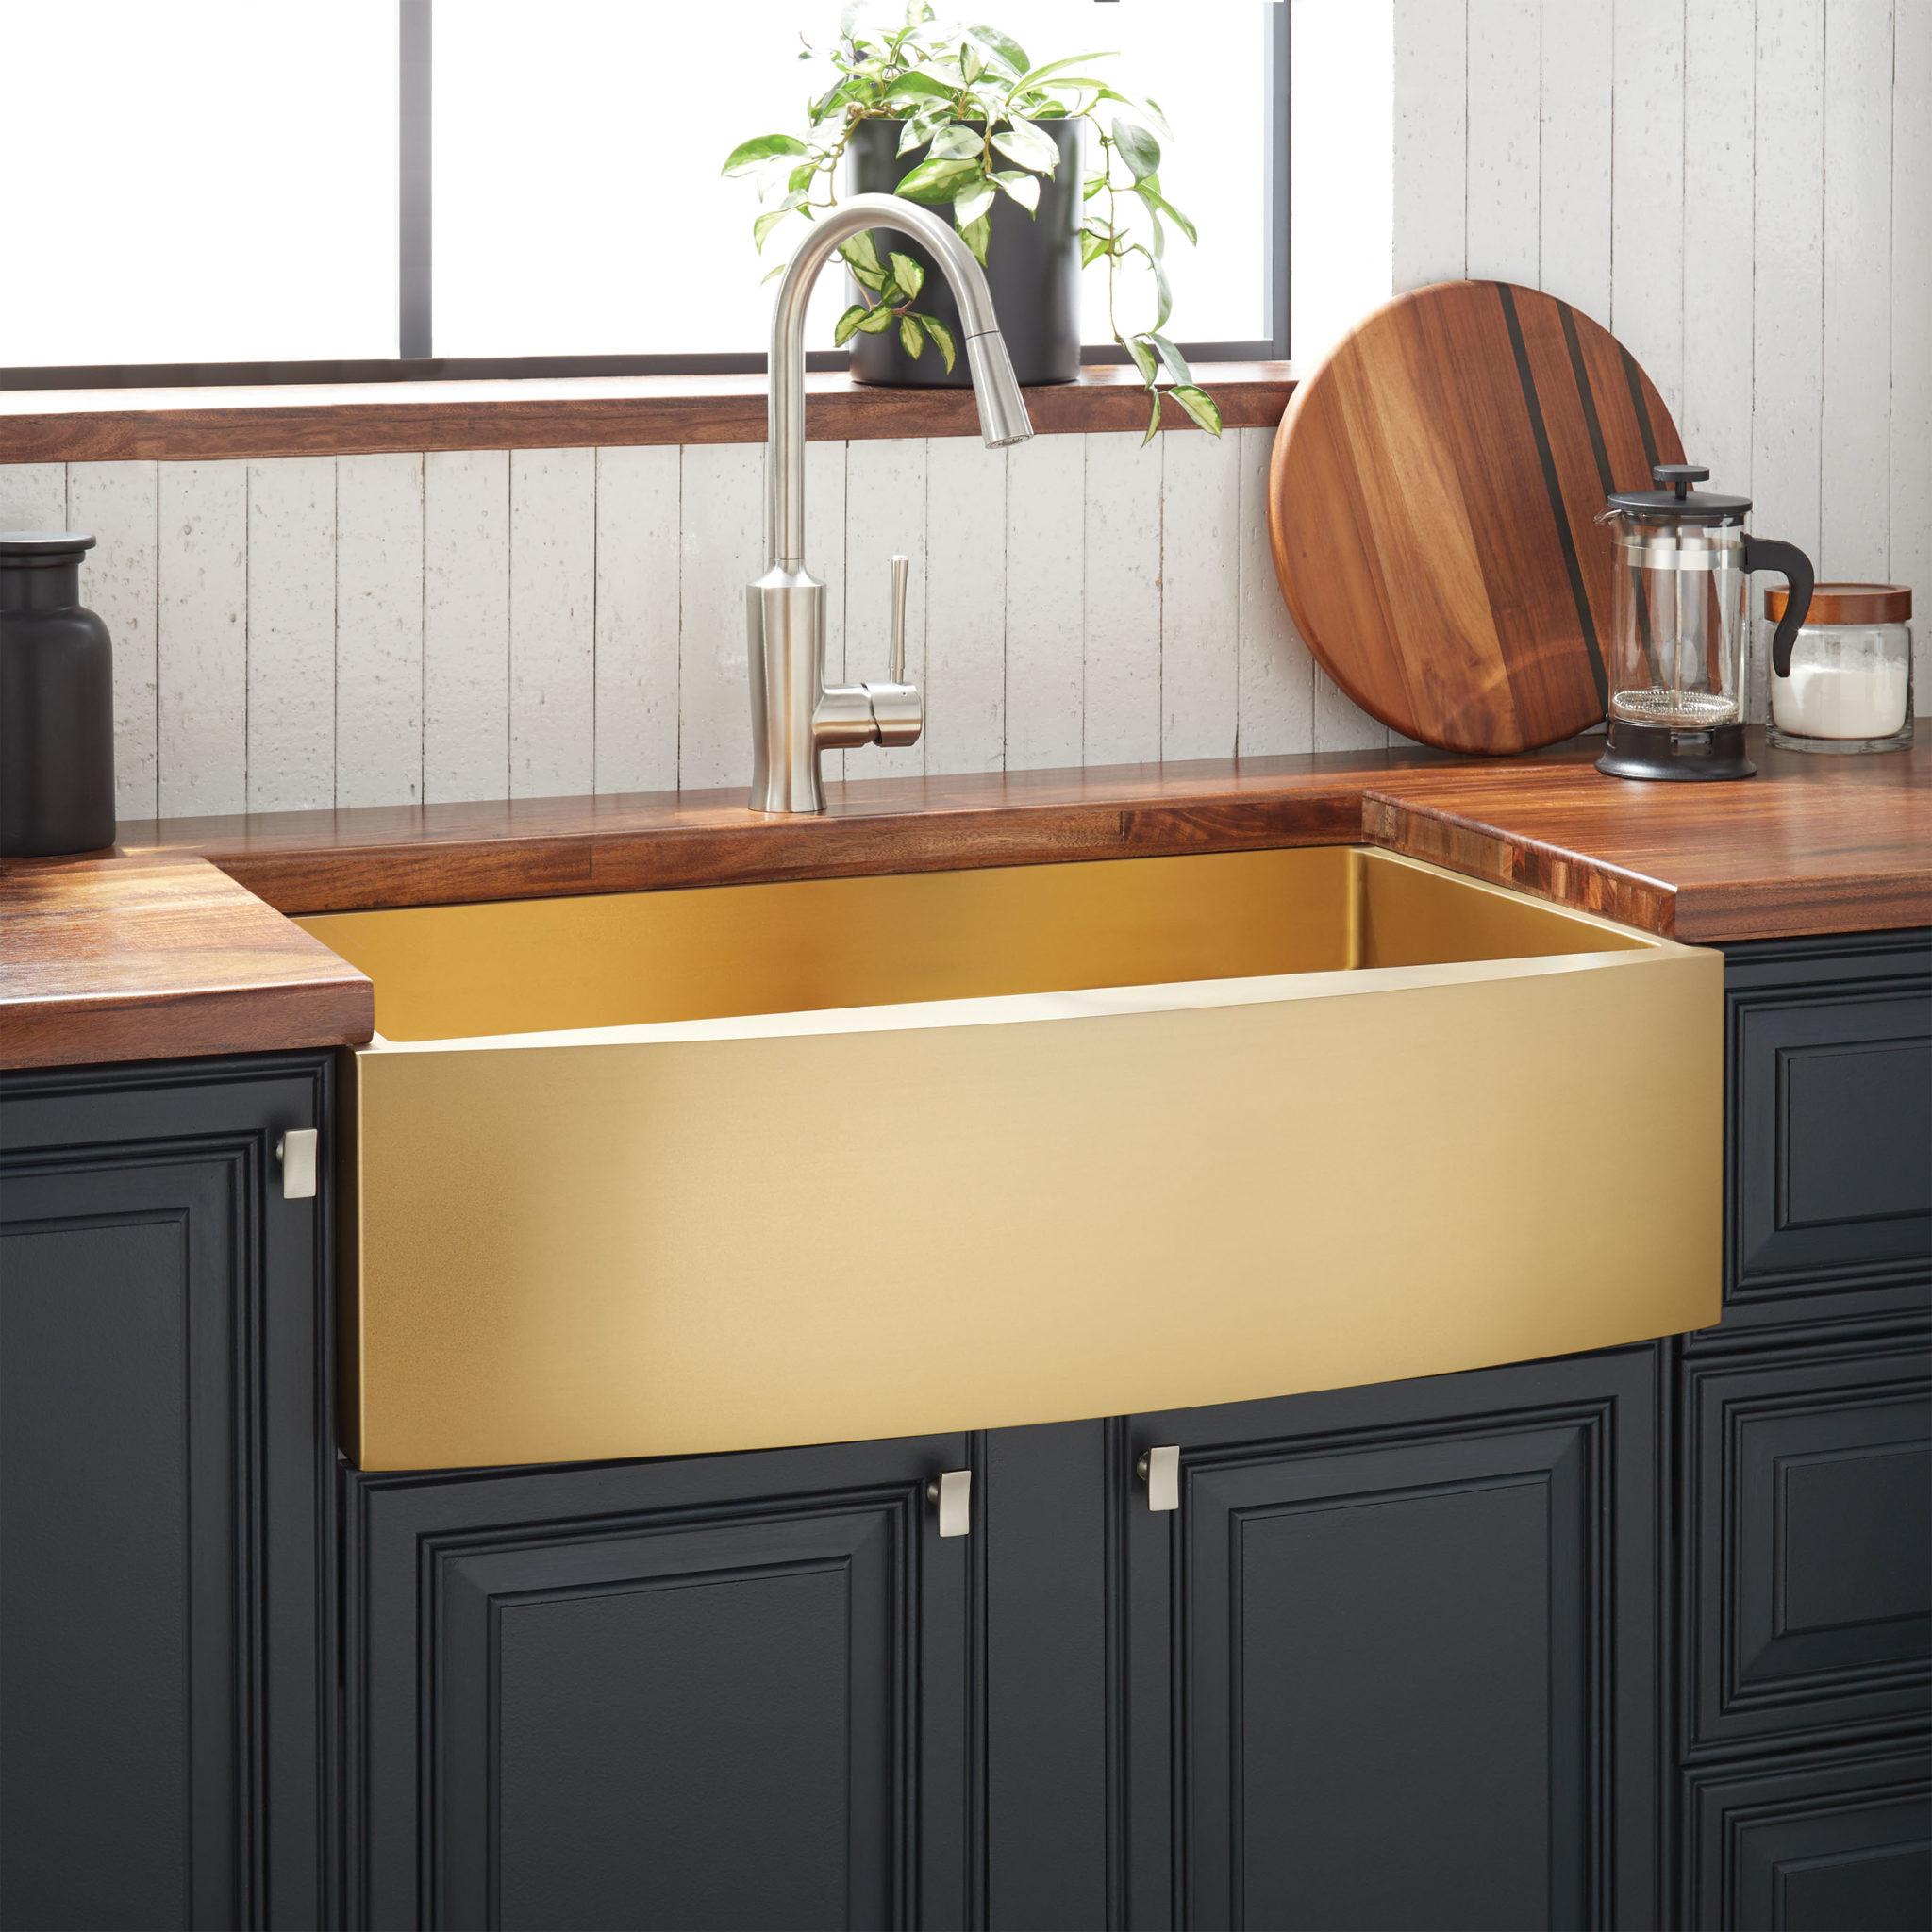 5 Farmhouse Sinks For All Styles Designnj